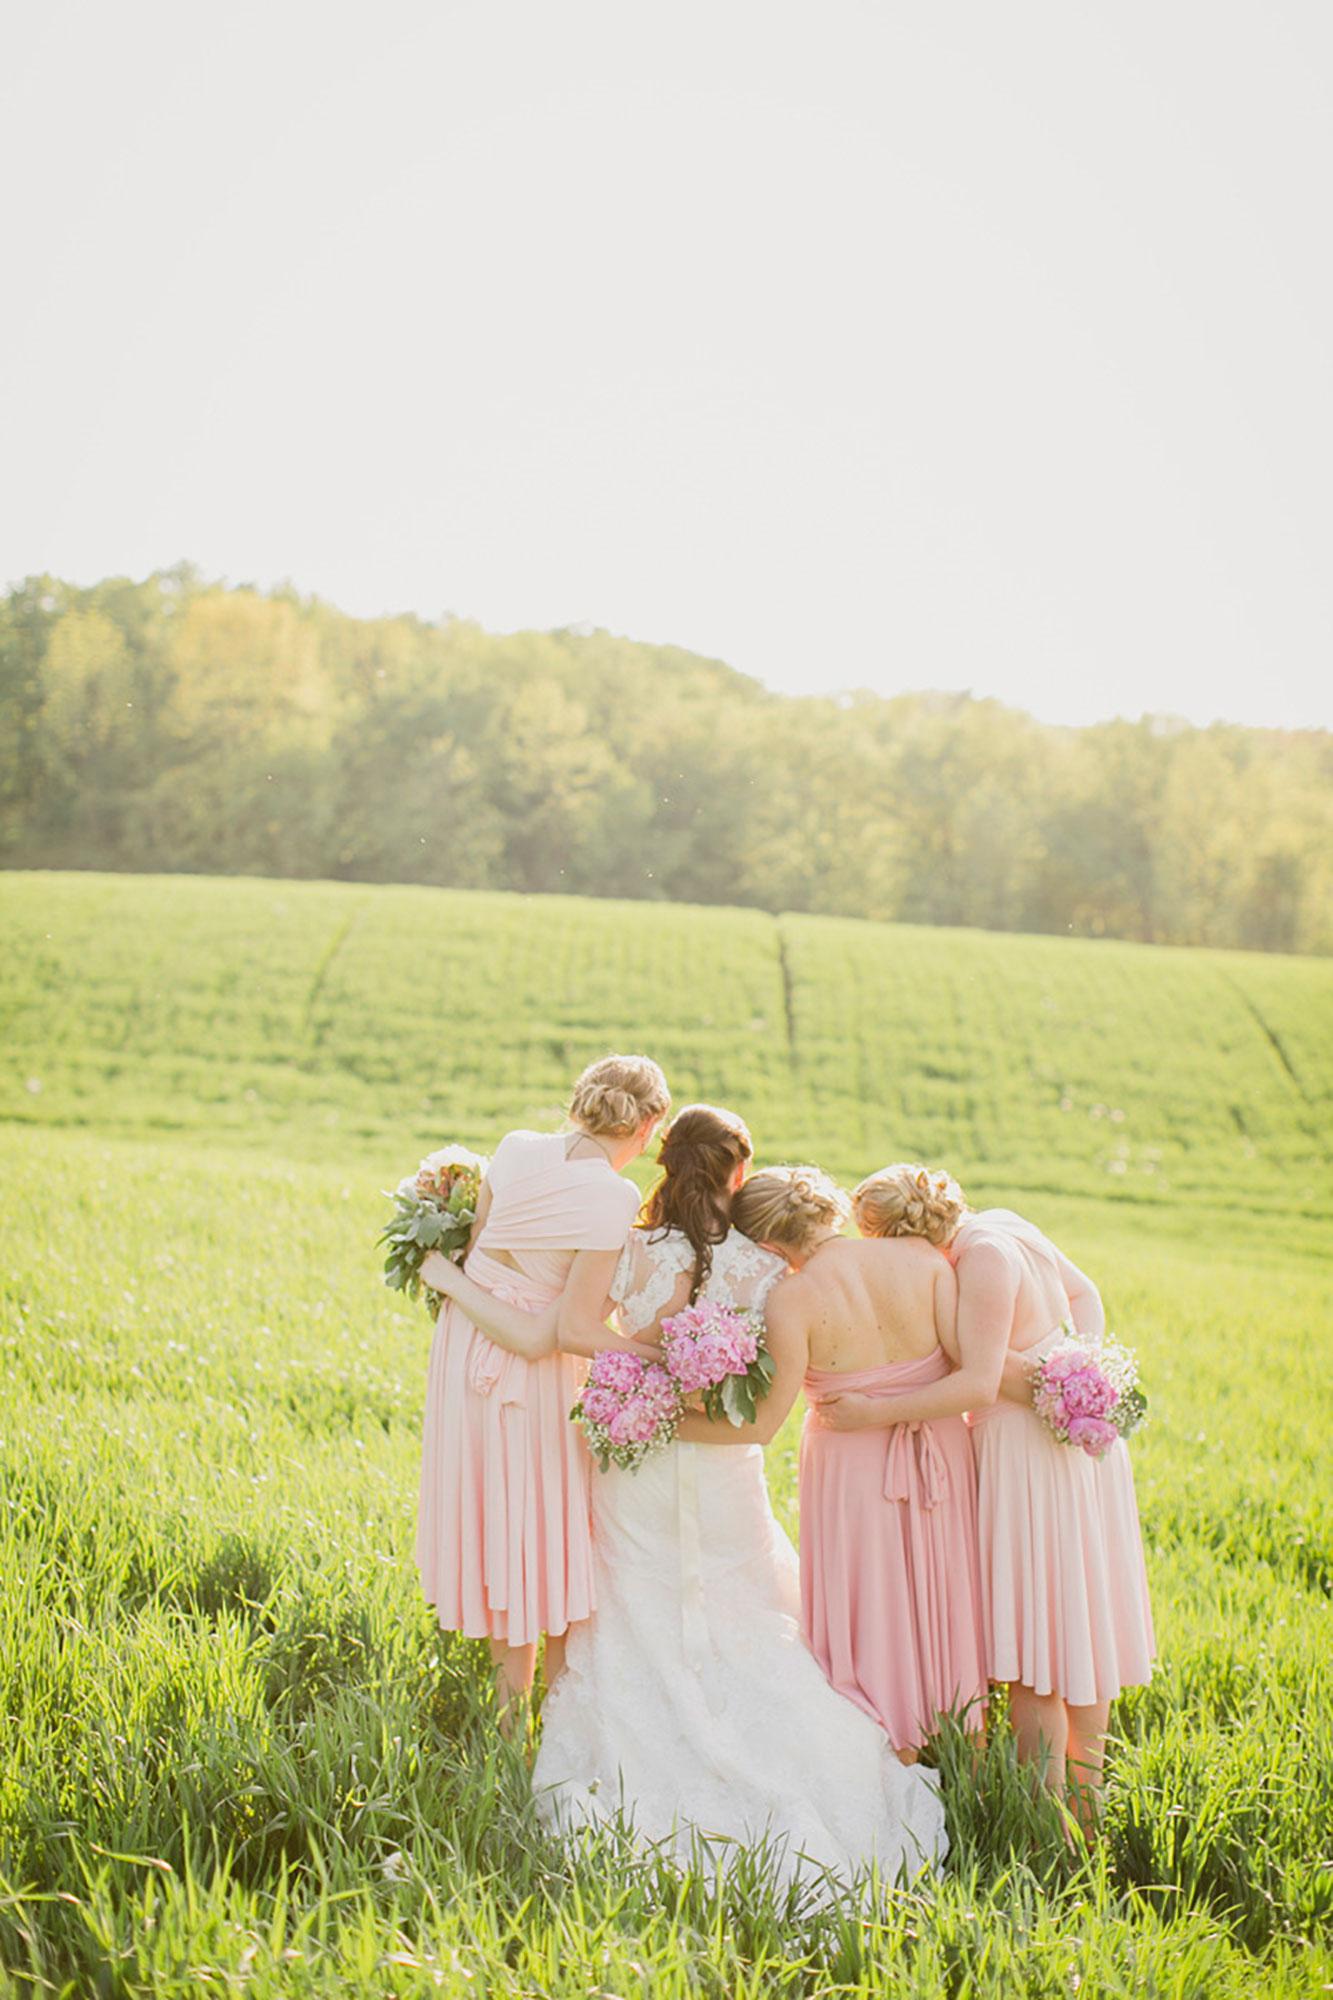 Balls-Falls-Vineyard-Bride-Photo-By-Elizabeth-in-Love-026.jpg